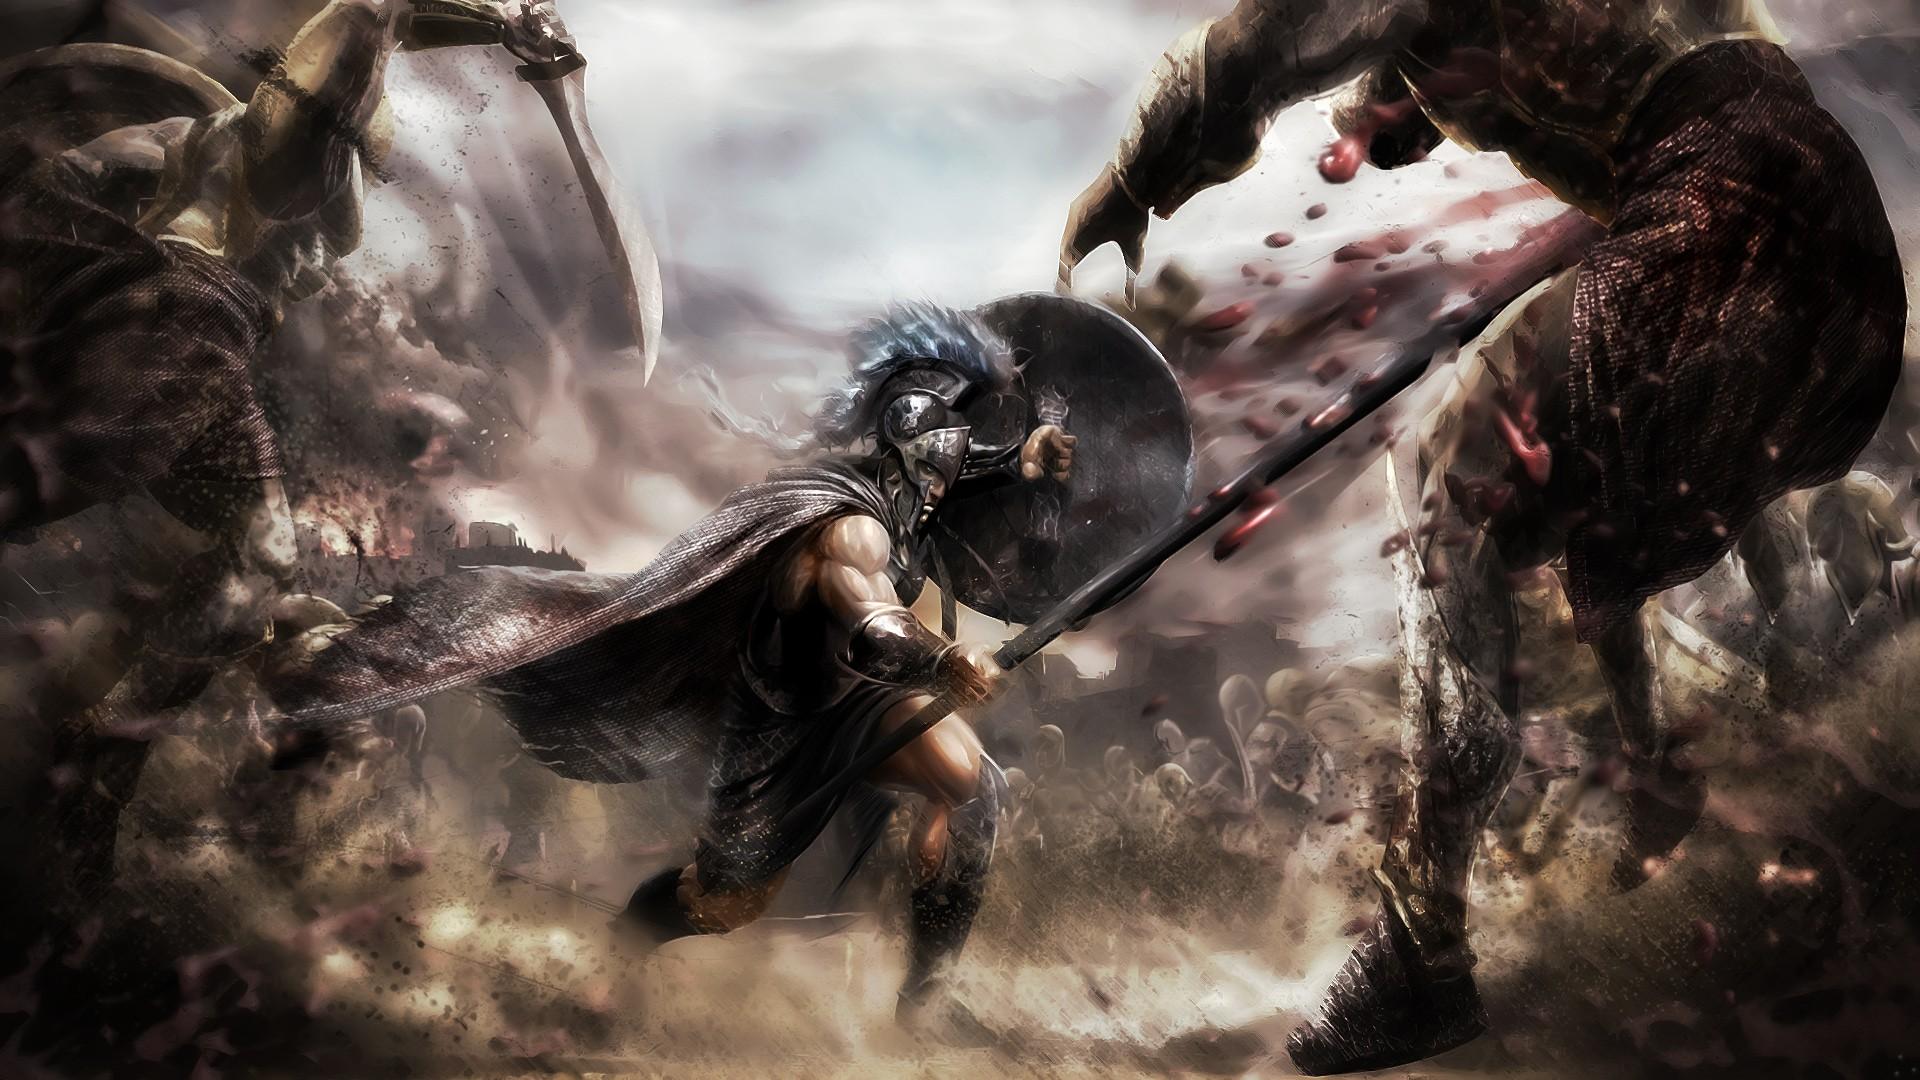 Warrior Wallpaper